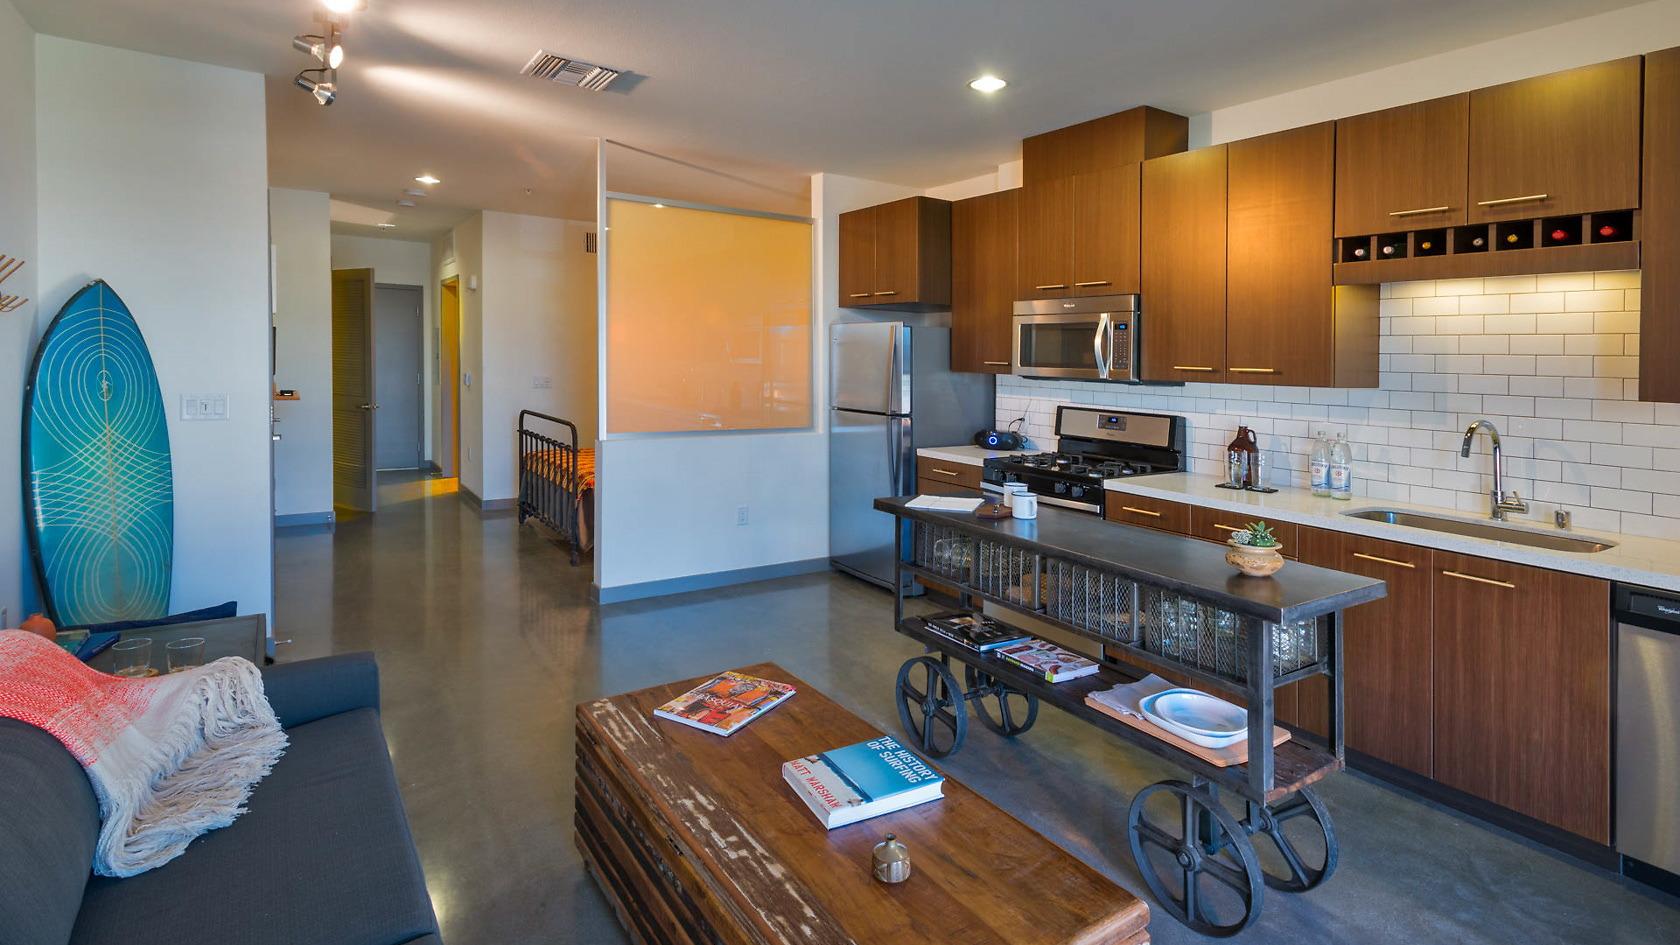 San Diego Intern Short Term Furnished Apartments